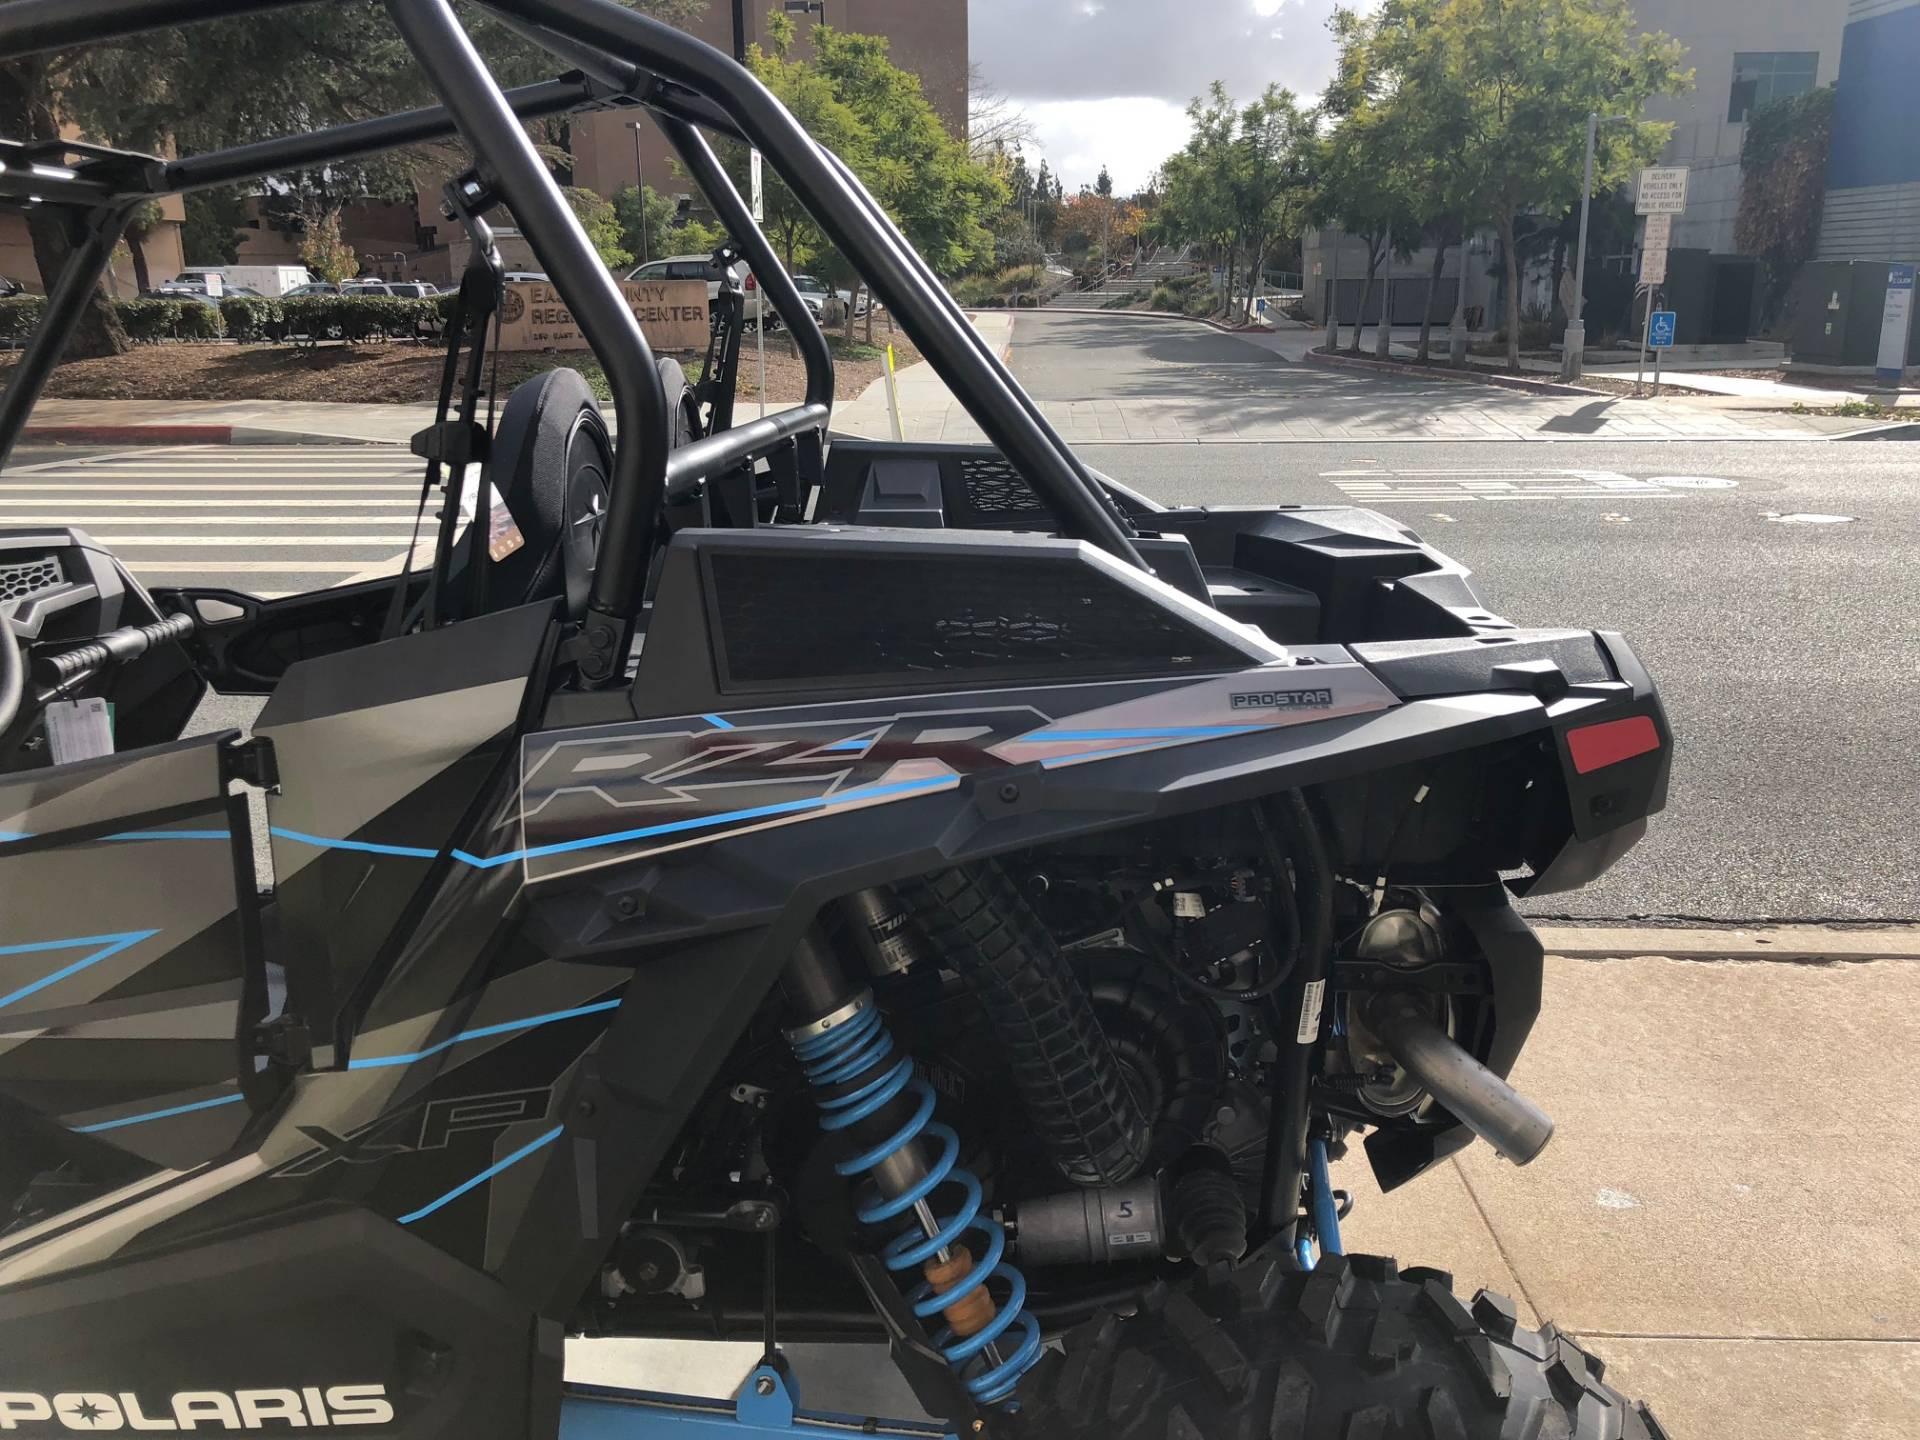 2019 Polaris RZR XP Turbo in EL Cajon, California